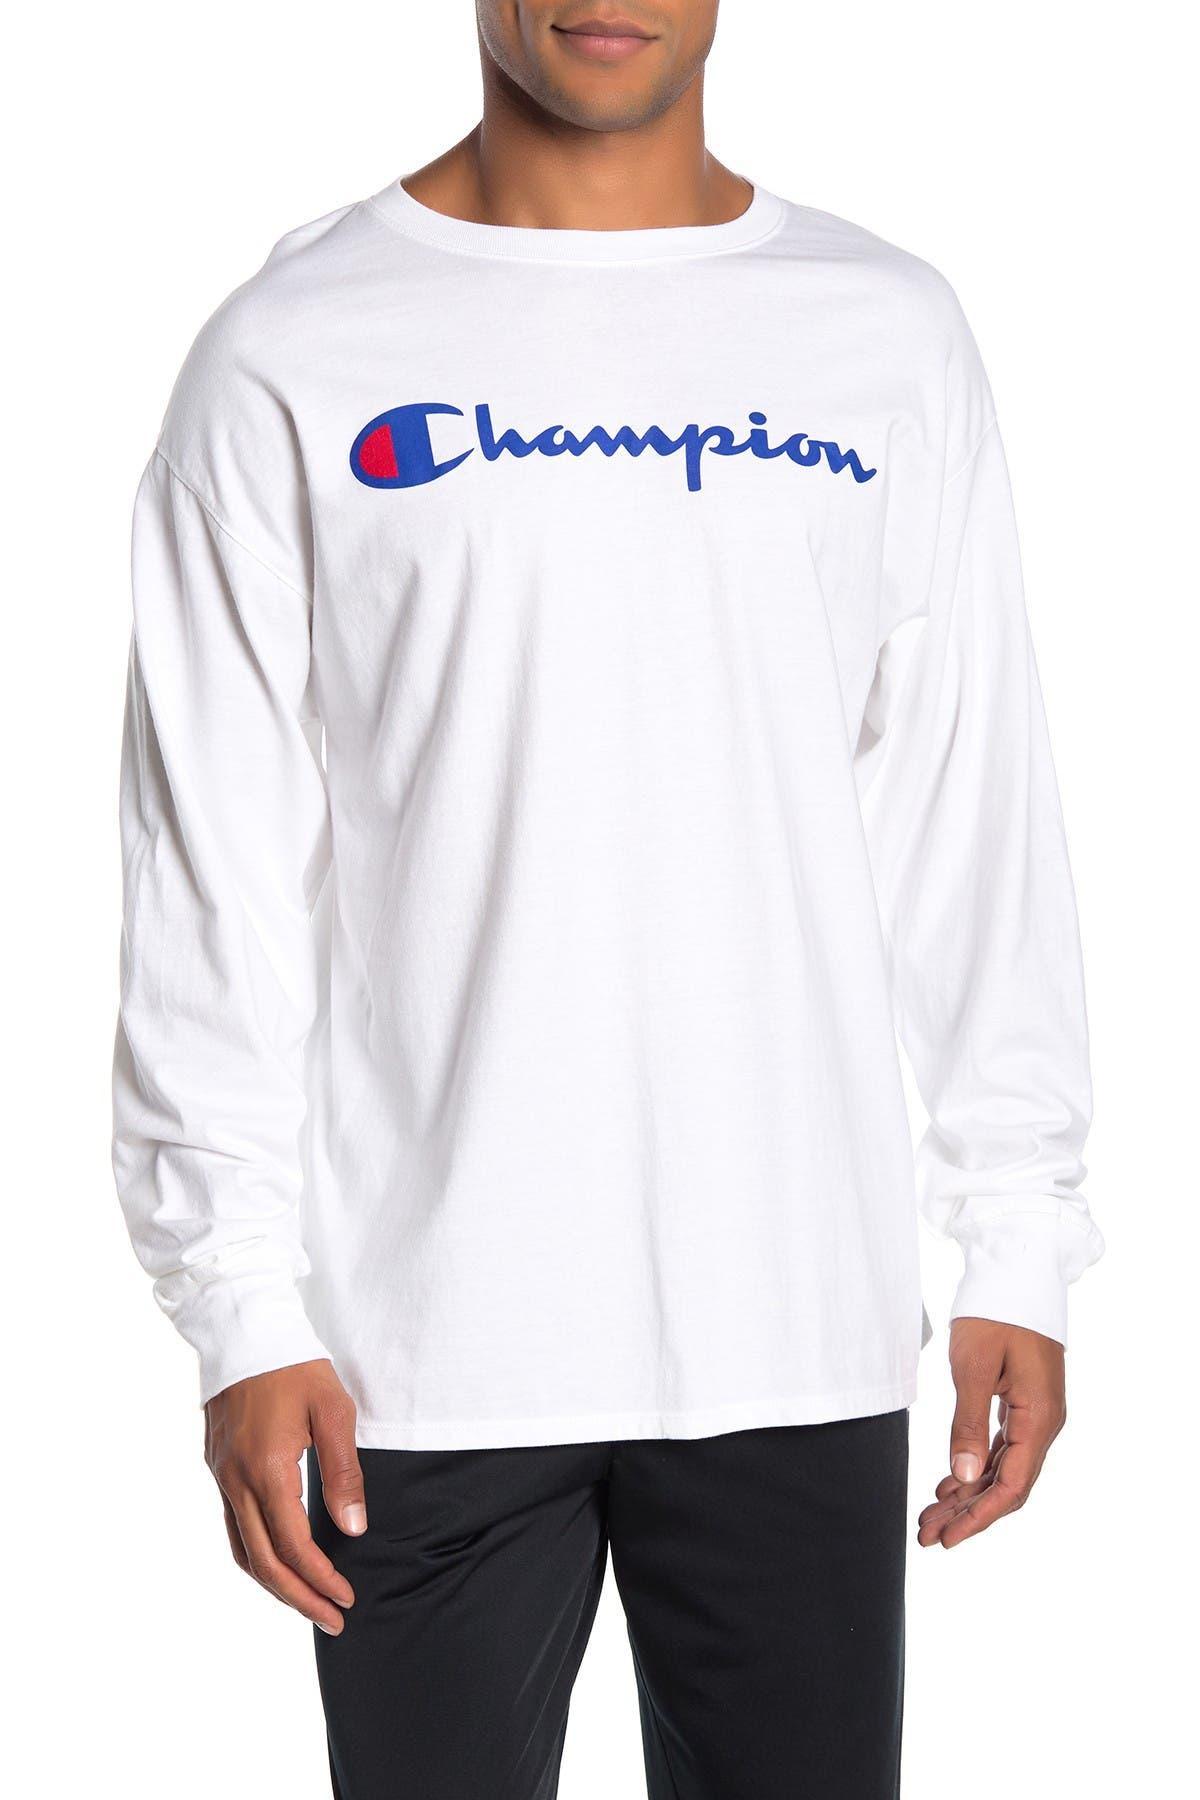 Image of Champion Logo Print Long Sleeve T-Shirt